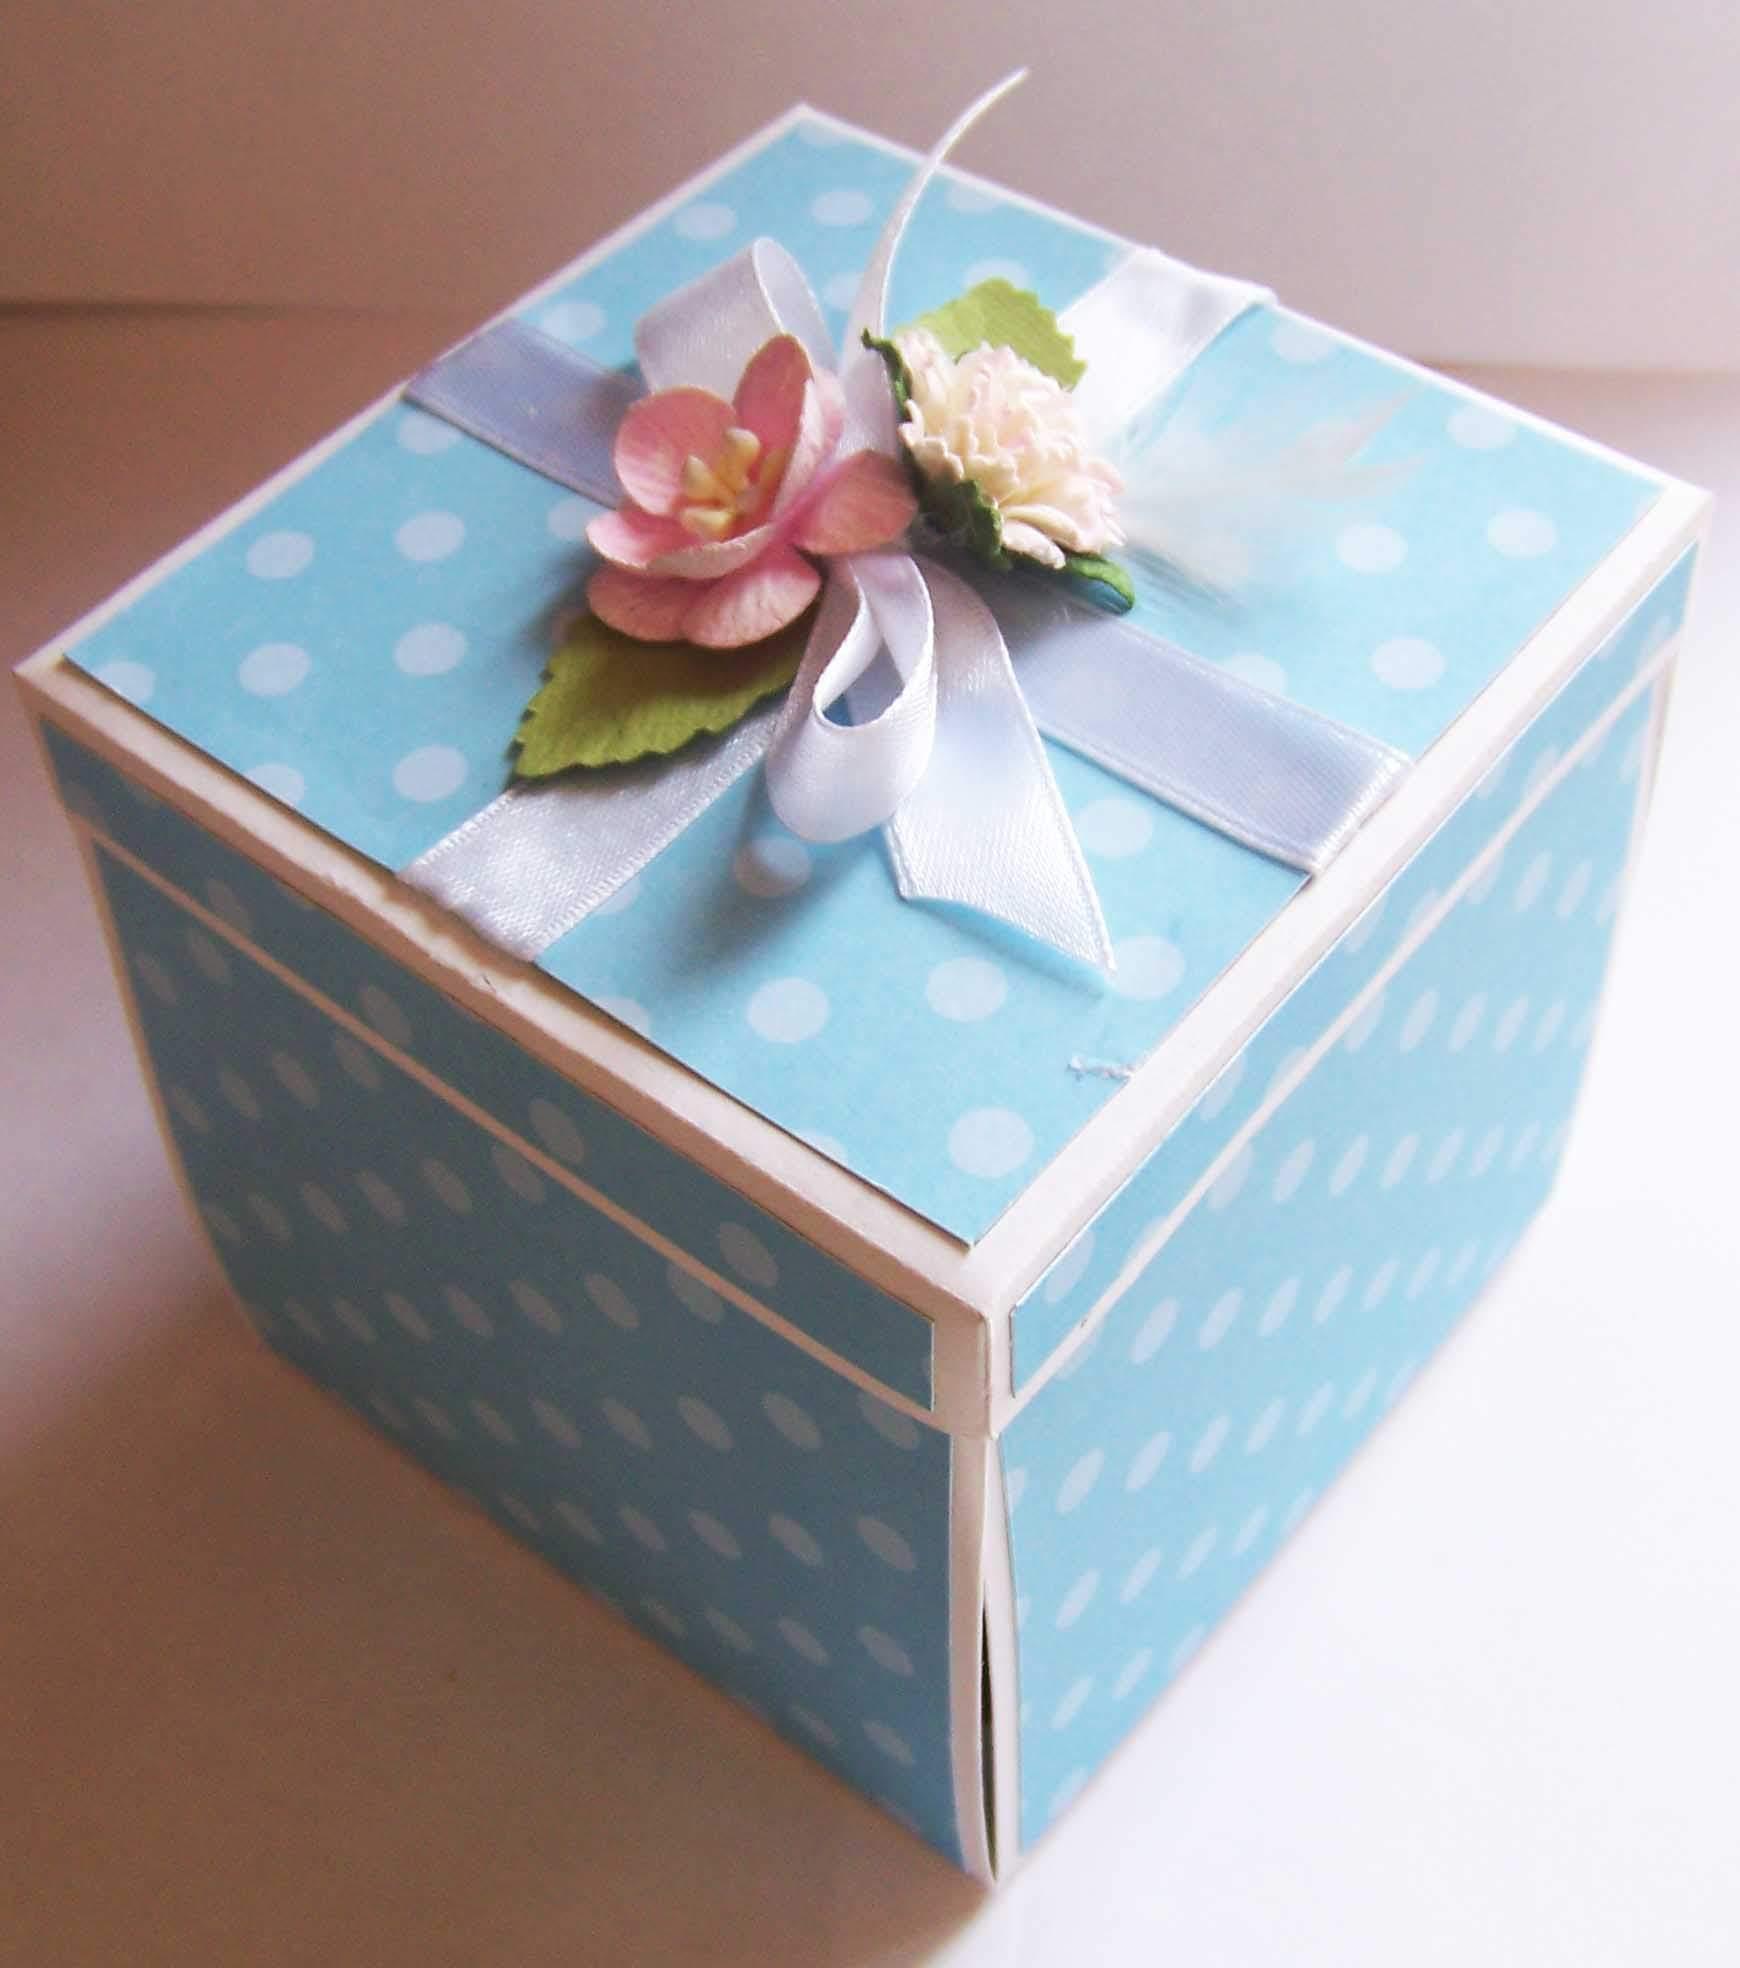 коробочки для подарков скрапбукинг фото объявления продаже дома